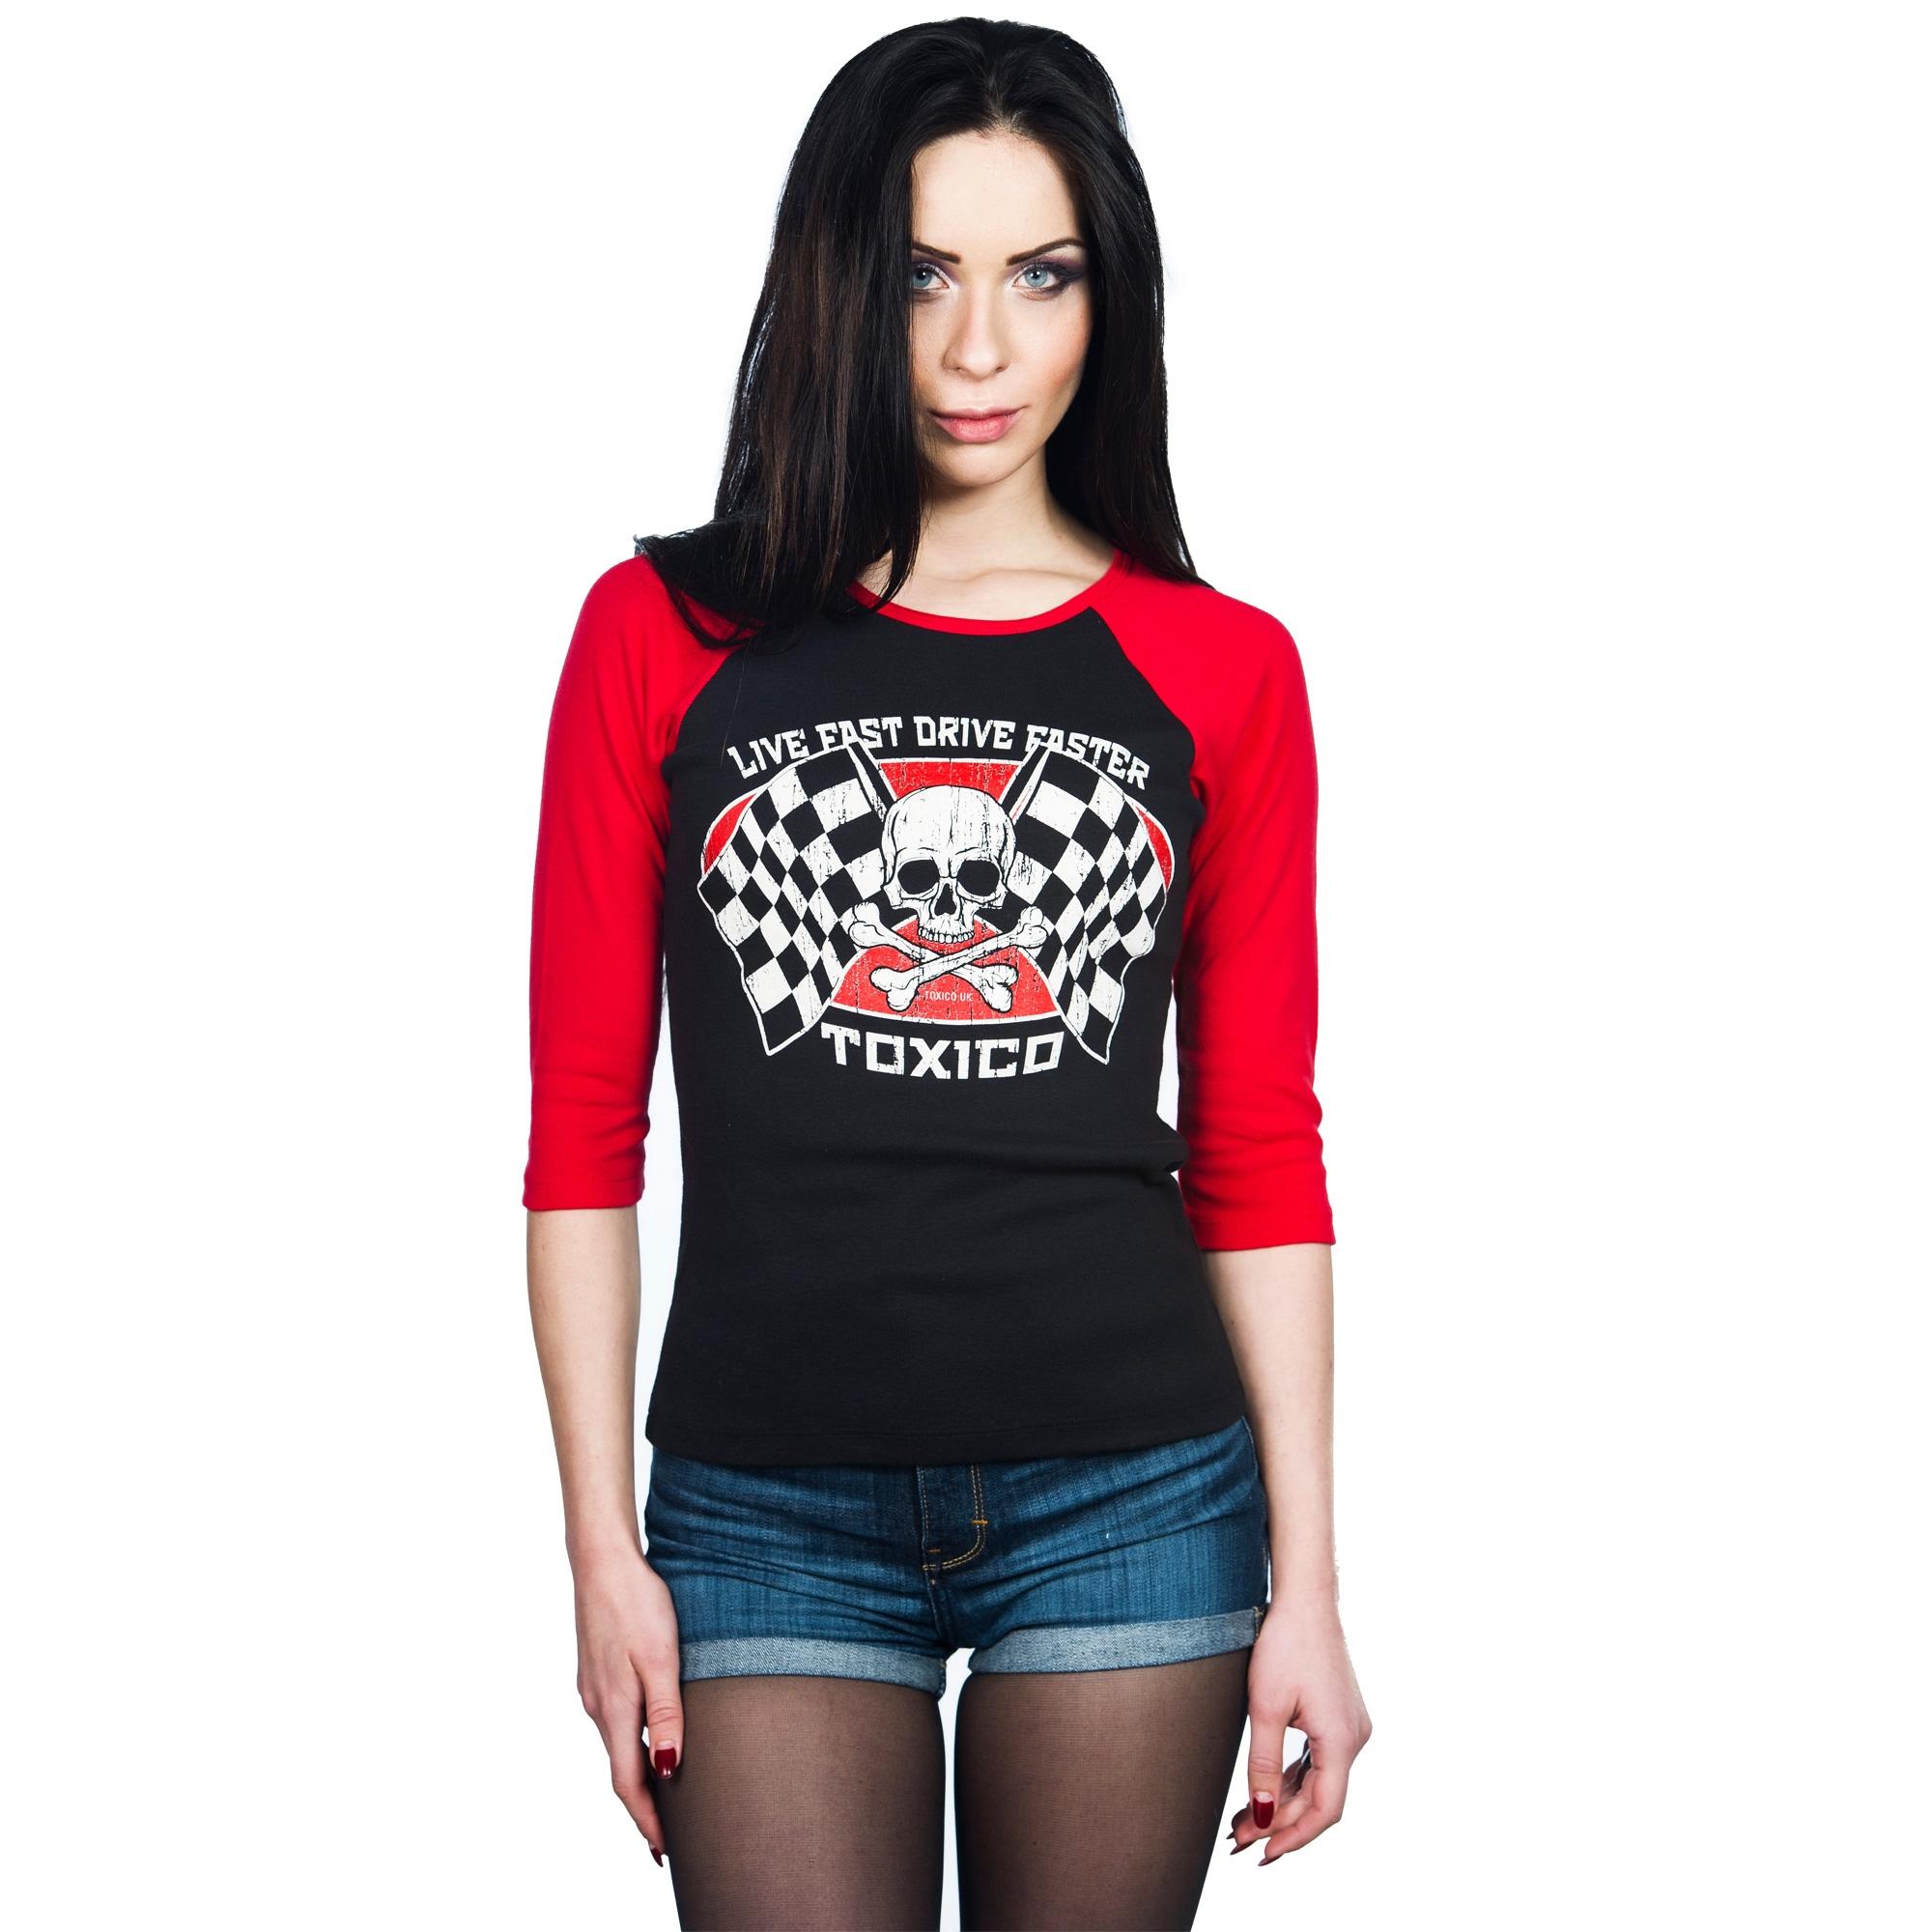 toxico-baseball-shirt-live-fast-red-black[1]